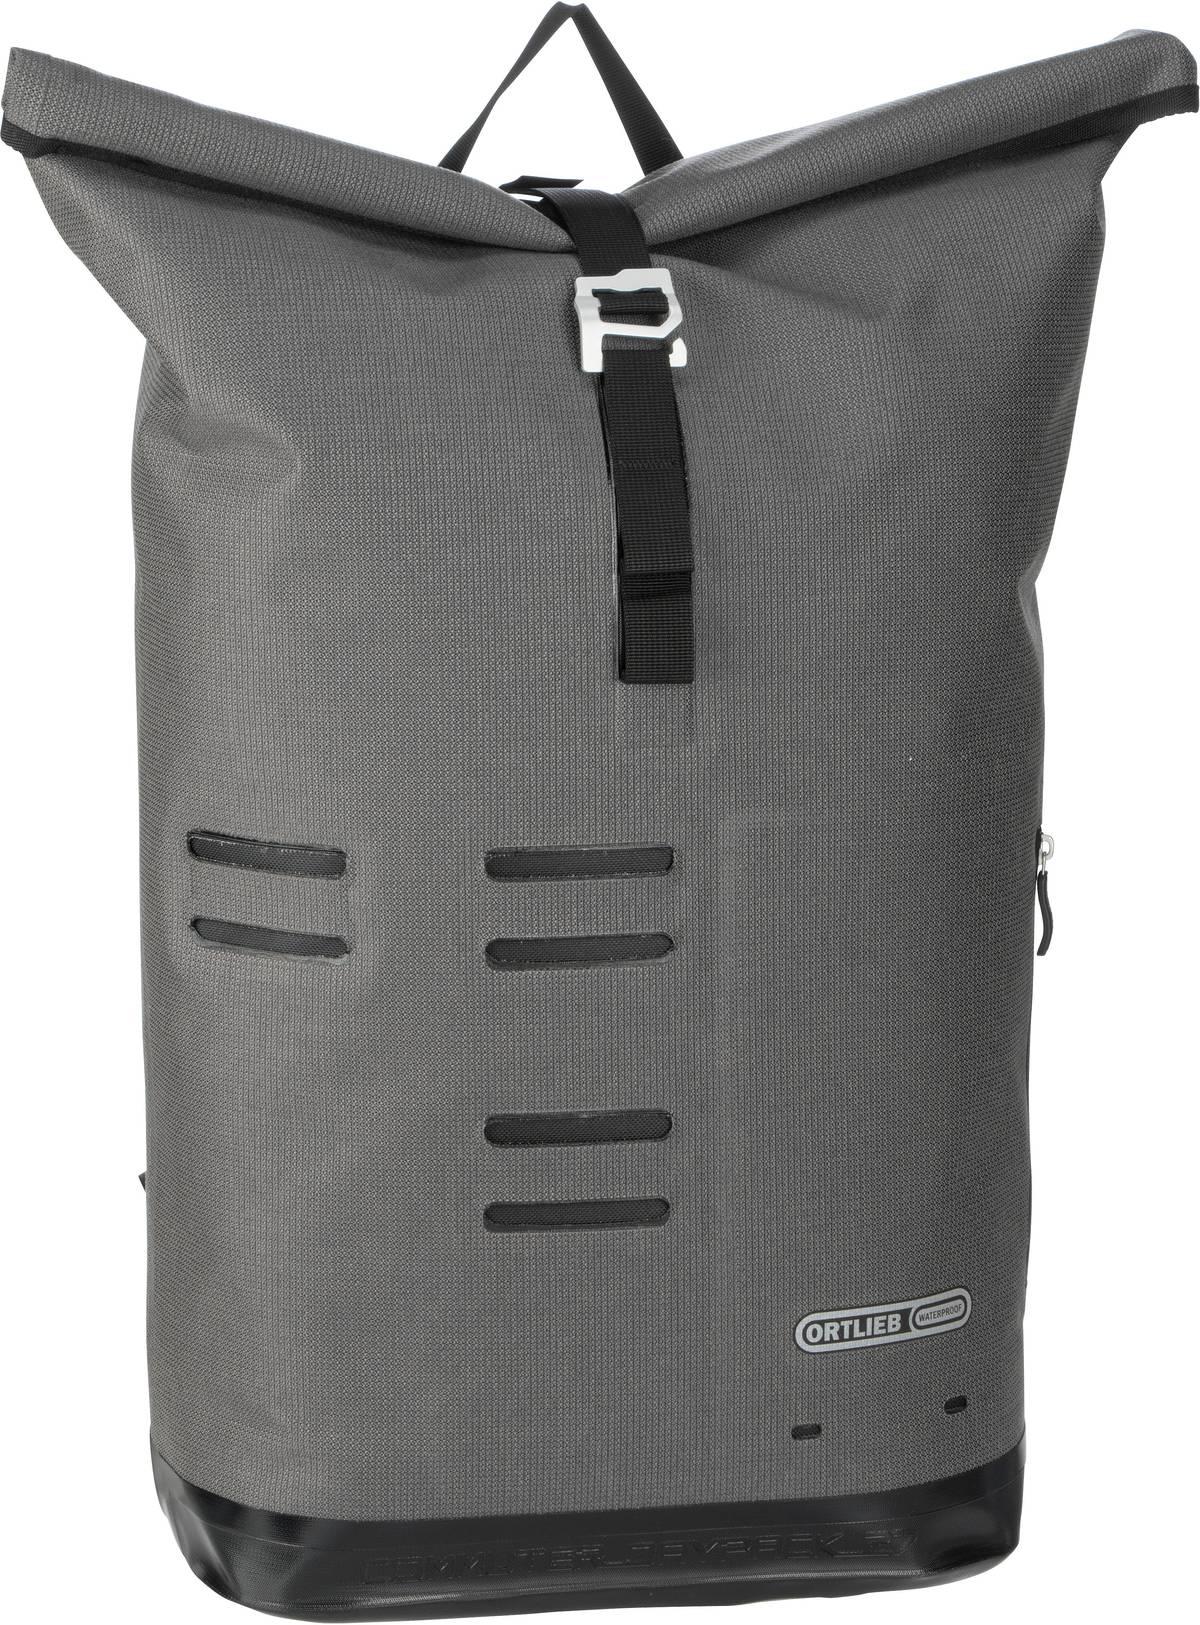 Rucksack / Daypack Commuter-Daypack Urban 27L Pepper (27 Liter)